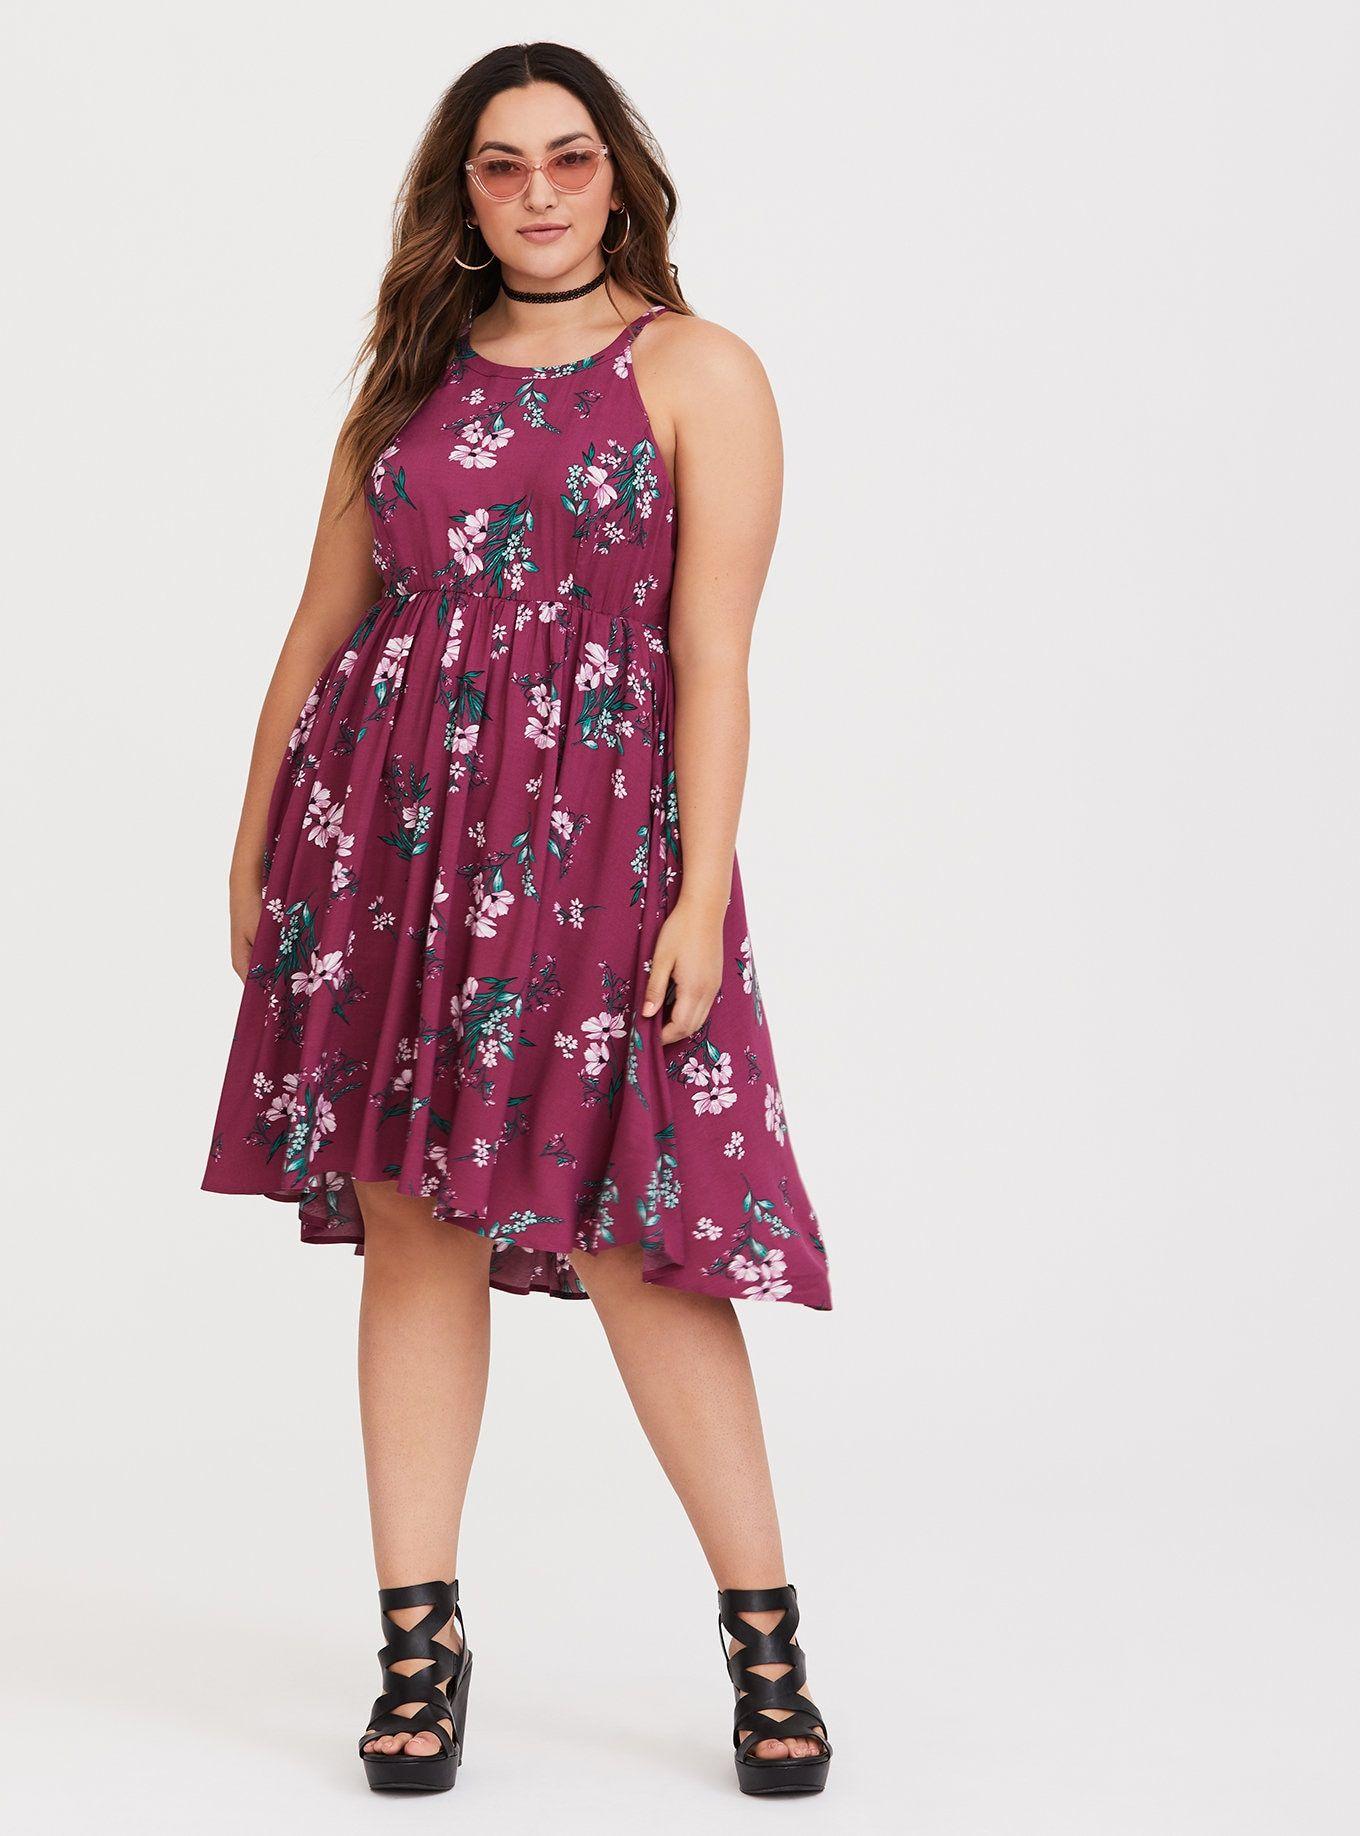 67cd2a454e1 Berry Hi-Lo Challis Dress